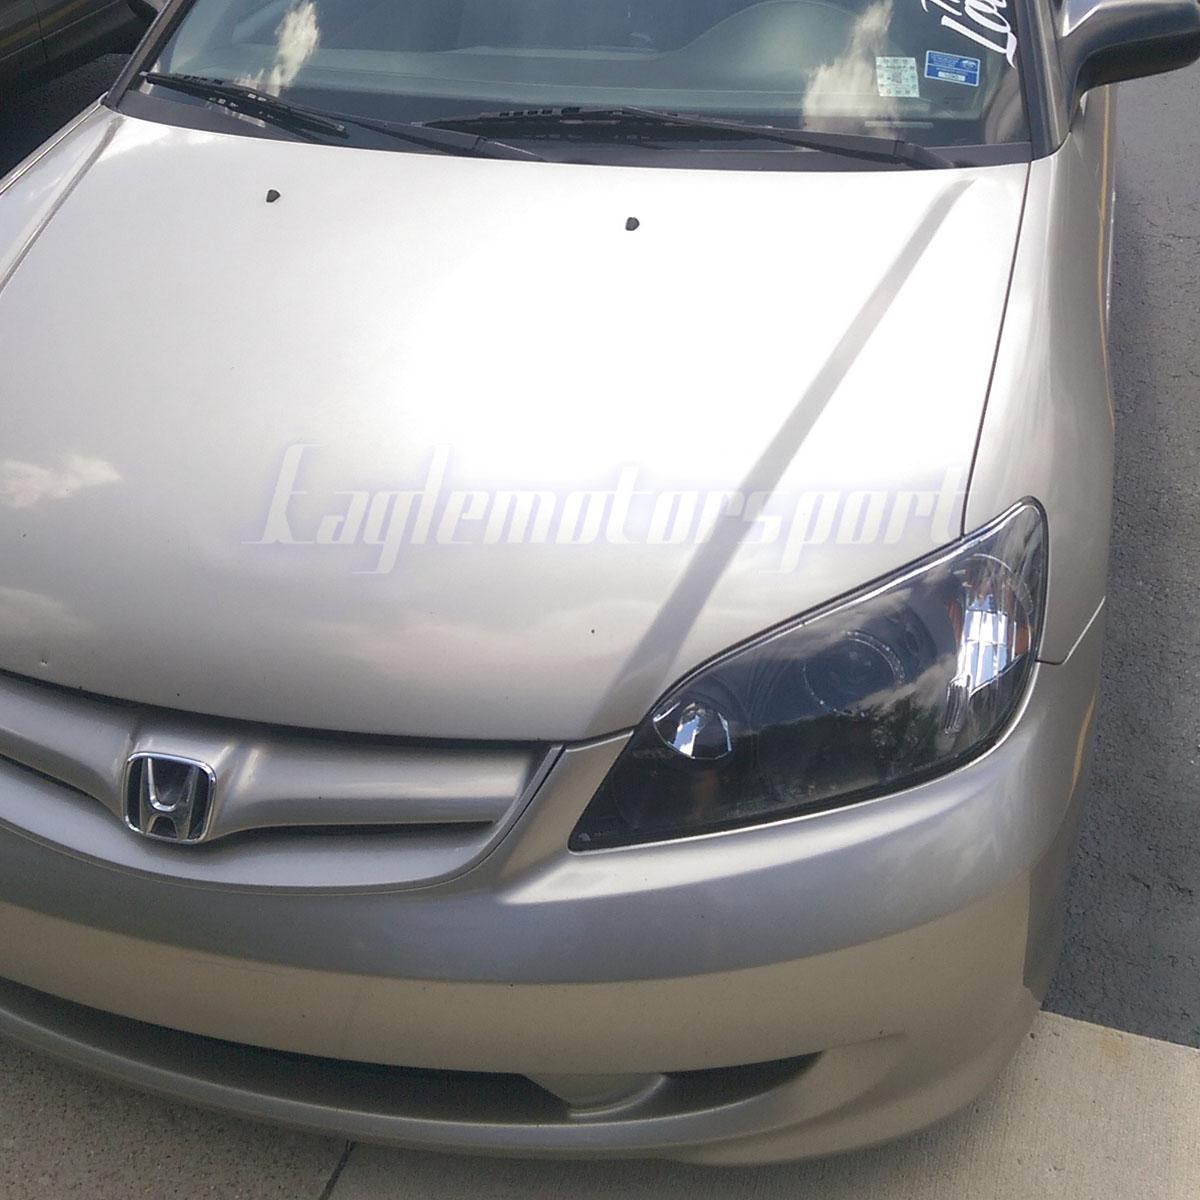 [LED Halo] 2004 2005 Honda Civic Coupe/Sedan Black